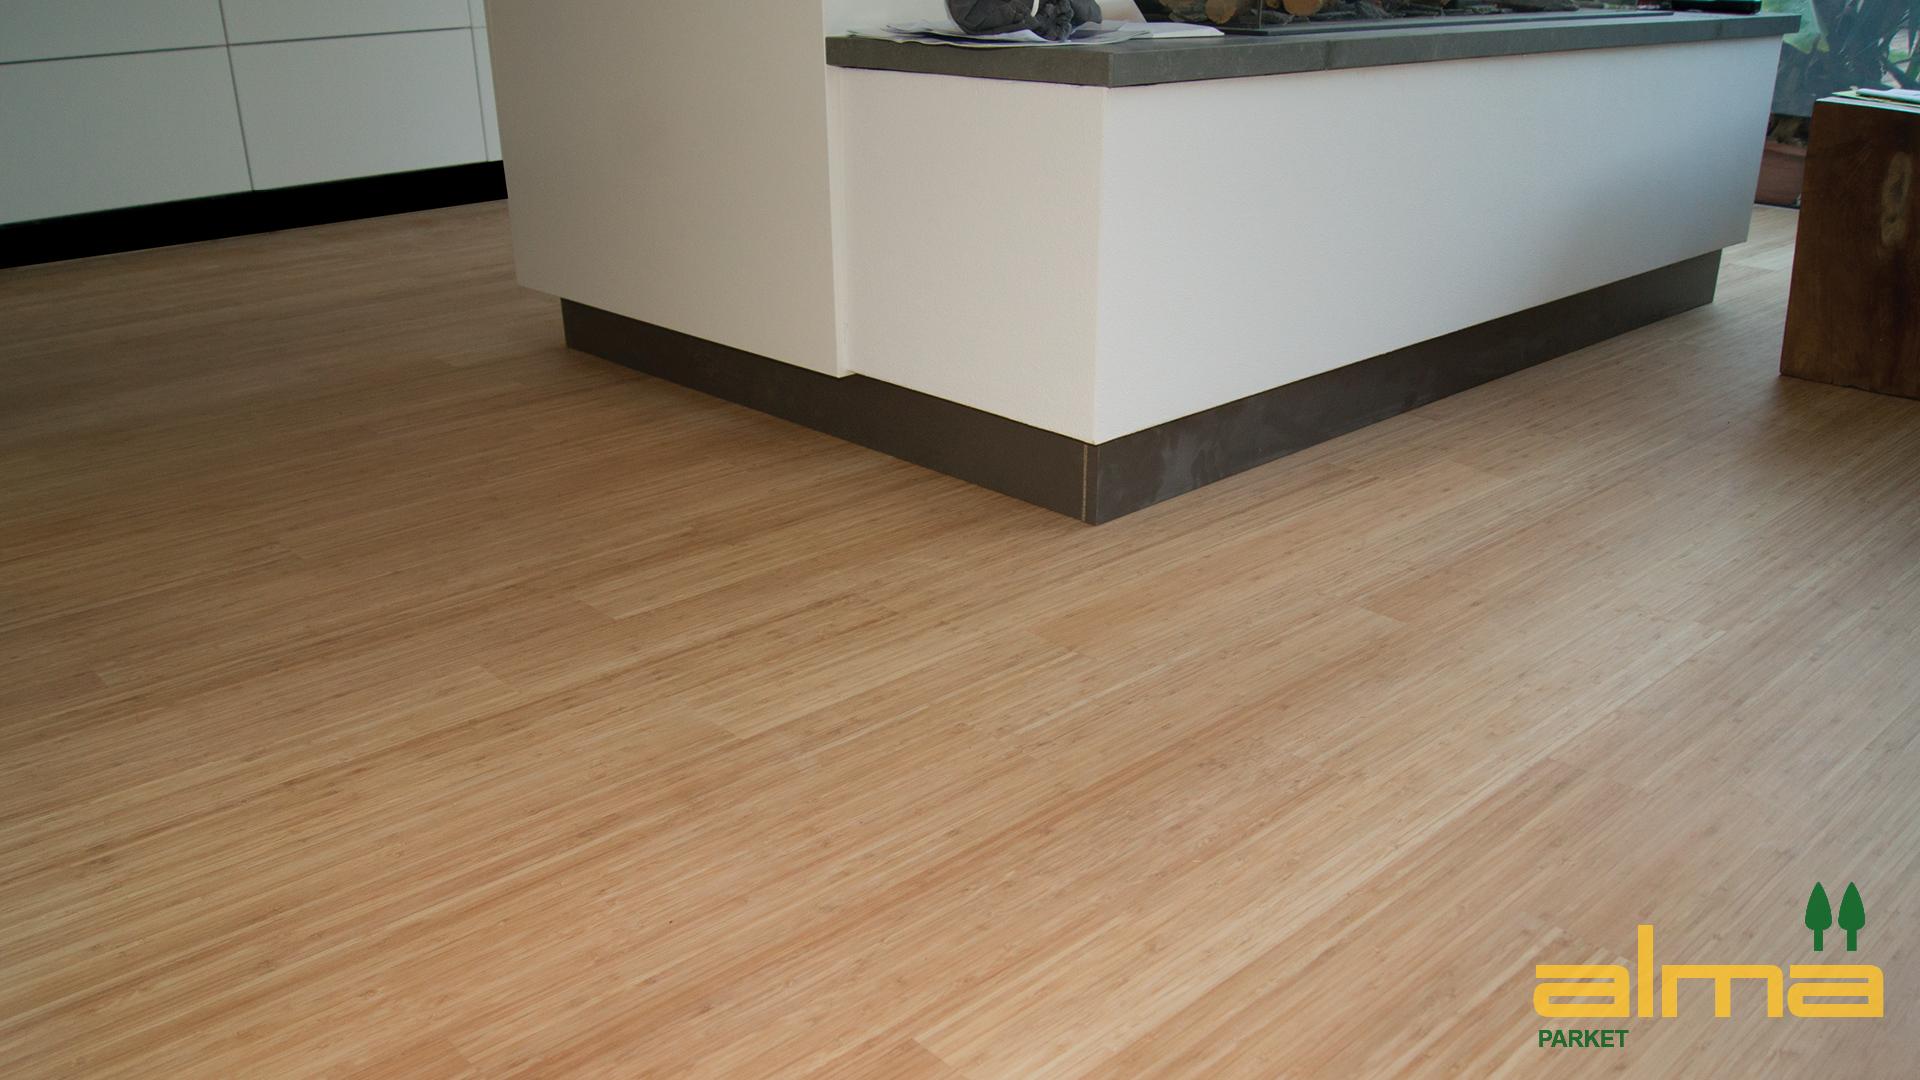 Bamboe Houten Vloer : Luxe bamboe houten vloer badkamermeubels ontwerpen